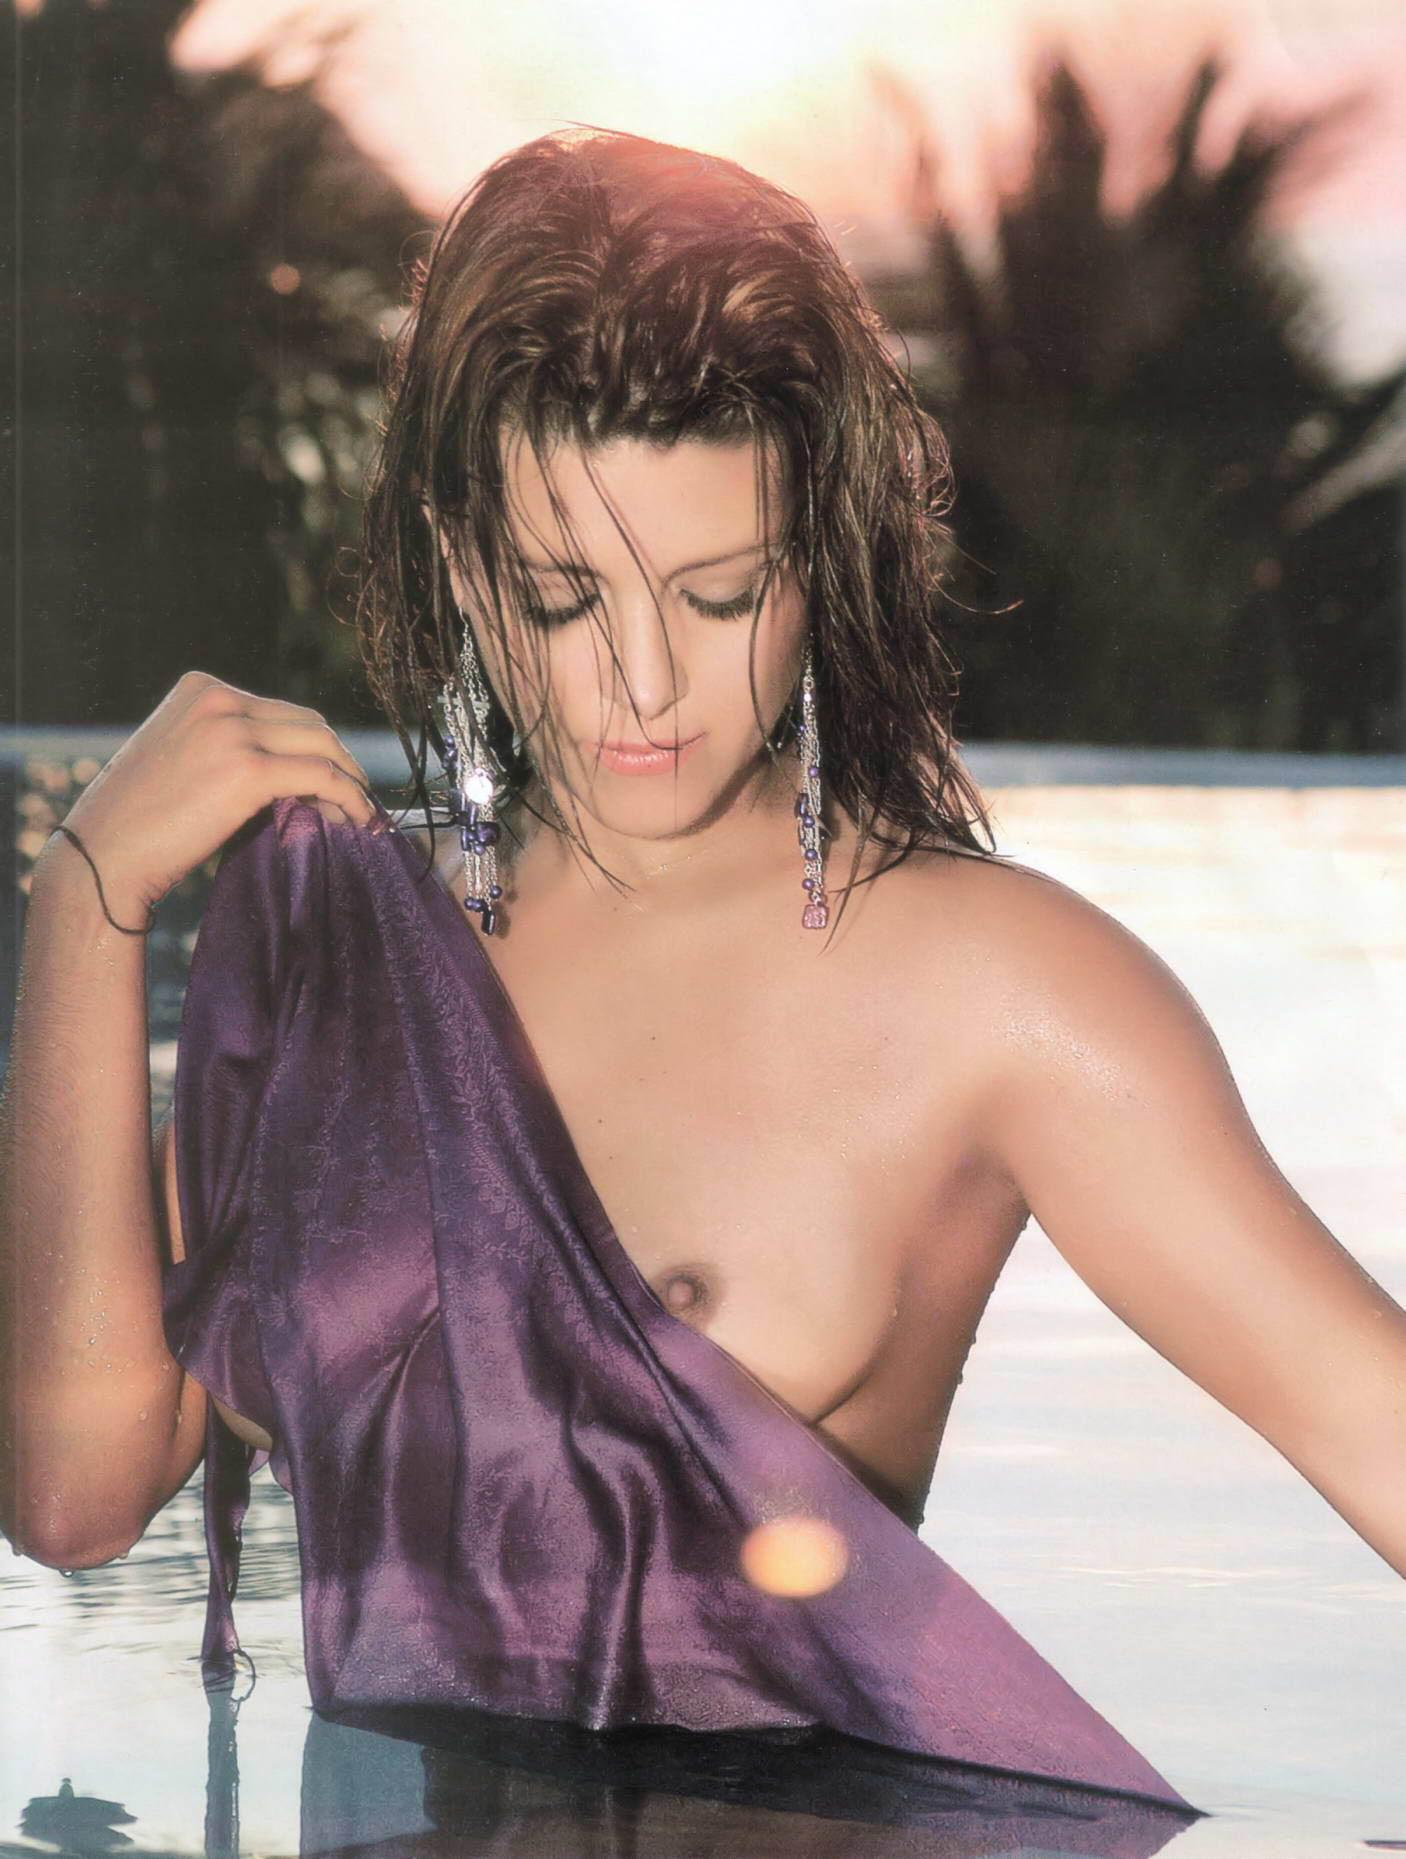 miss nude minnesota free playboy sex movies